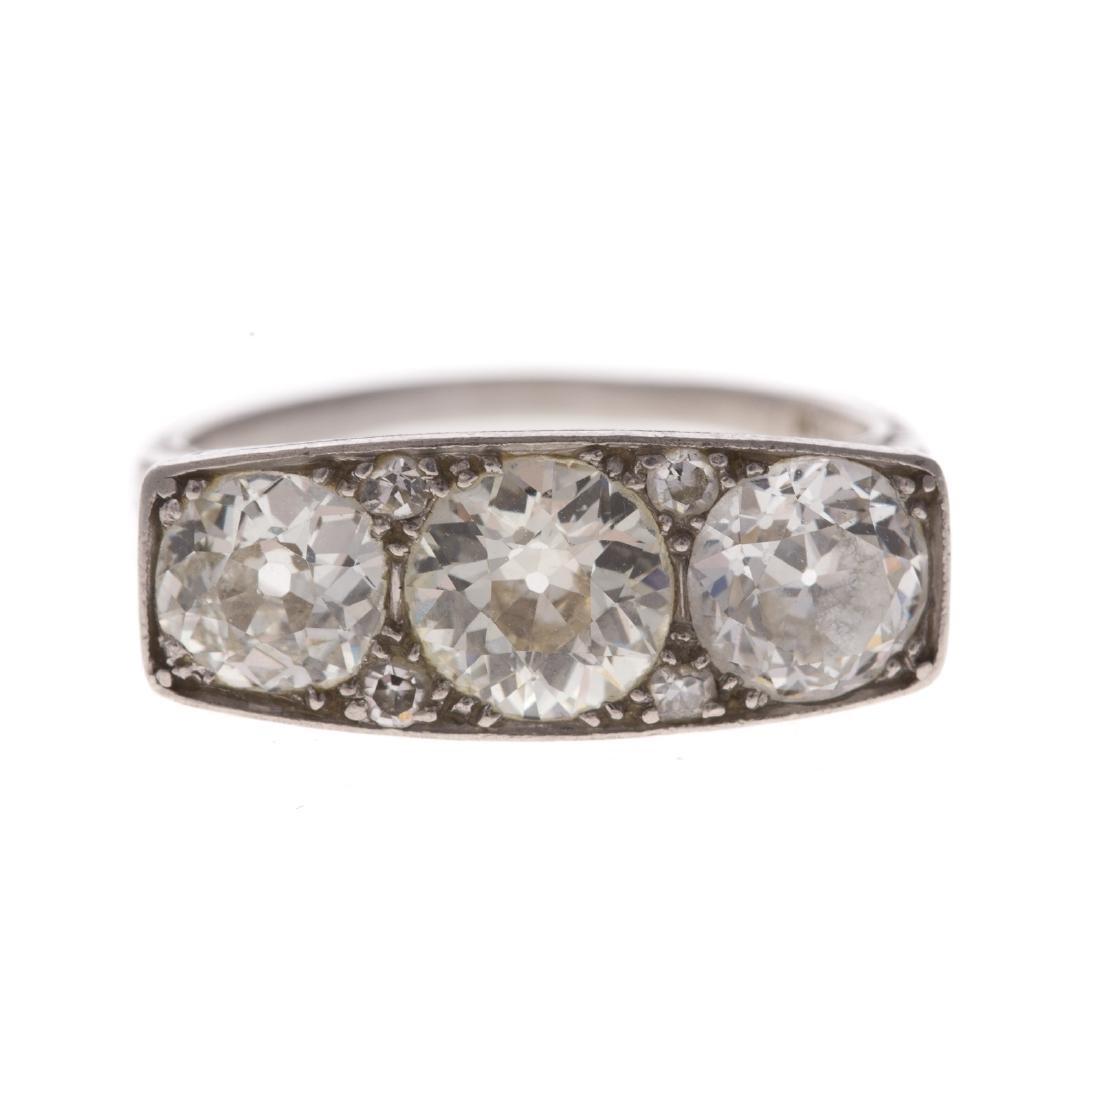 An Art Deco Filigree Diamond Ring in Platinum